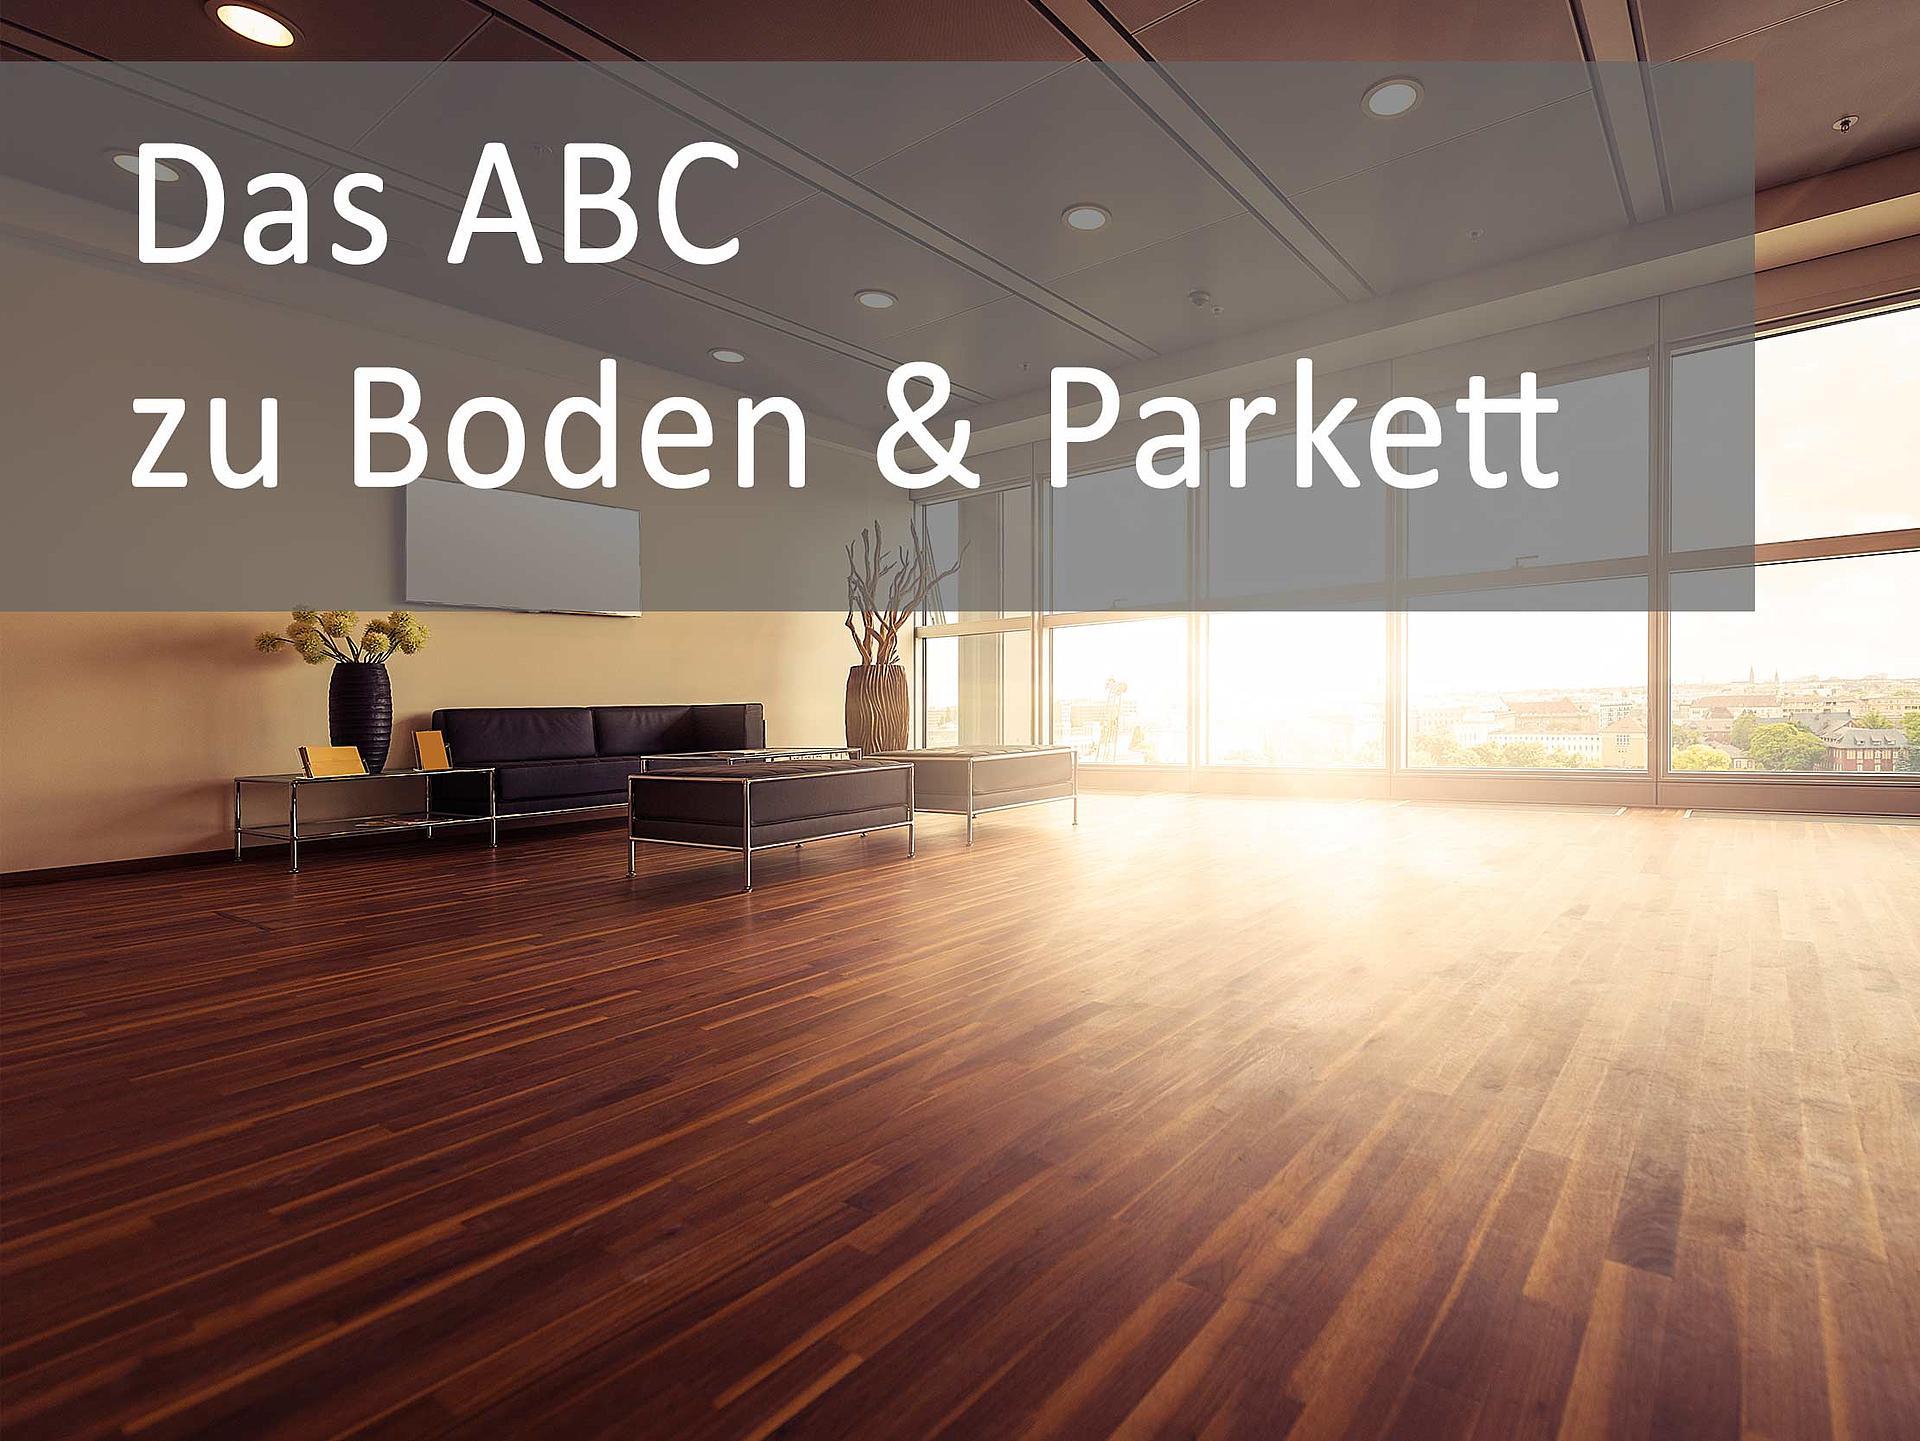 Fußboden Bad Homburg ~ Vinylboden vinylparkett designboden bad nauheim frankfurt hanau